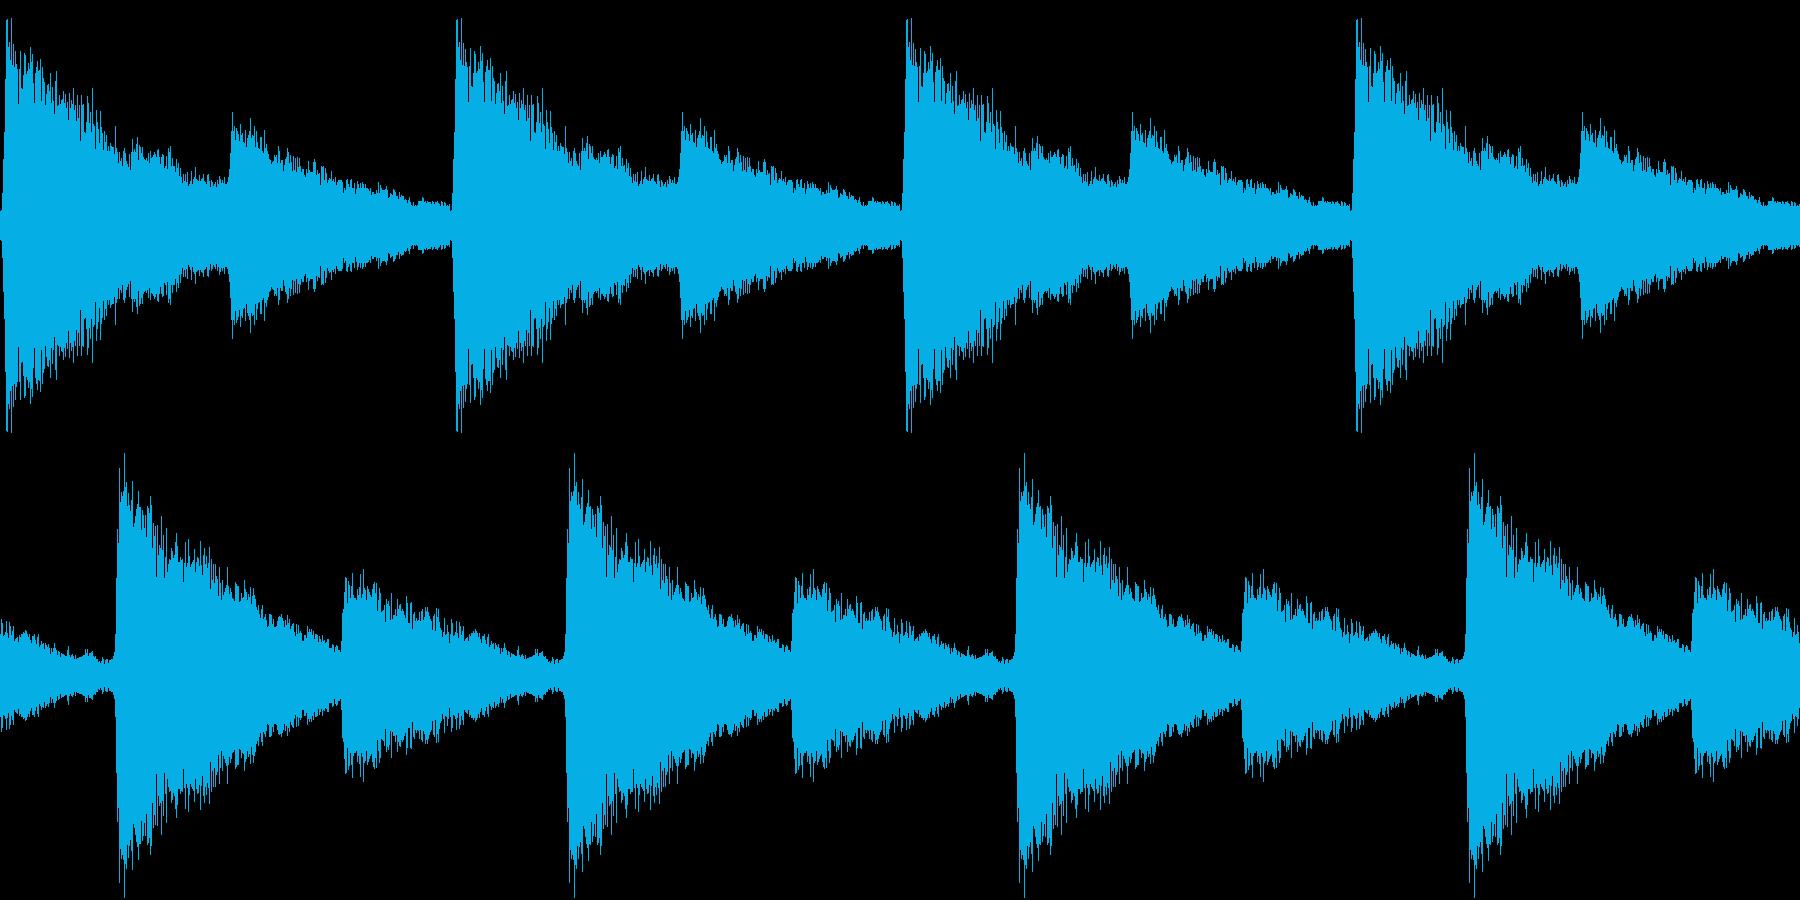 Siren 踏切りのサイレン REMIXの再生済みの波形